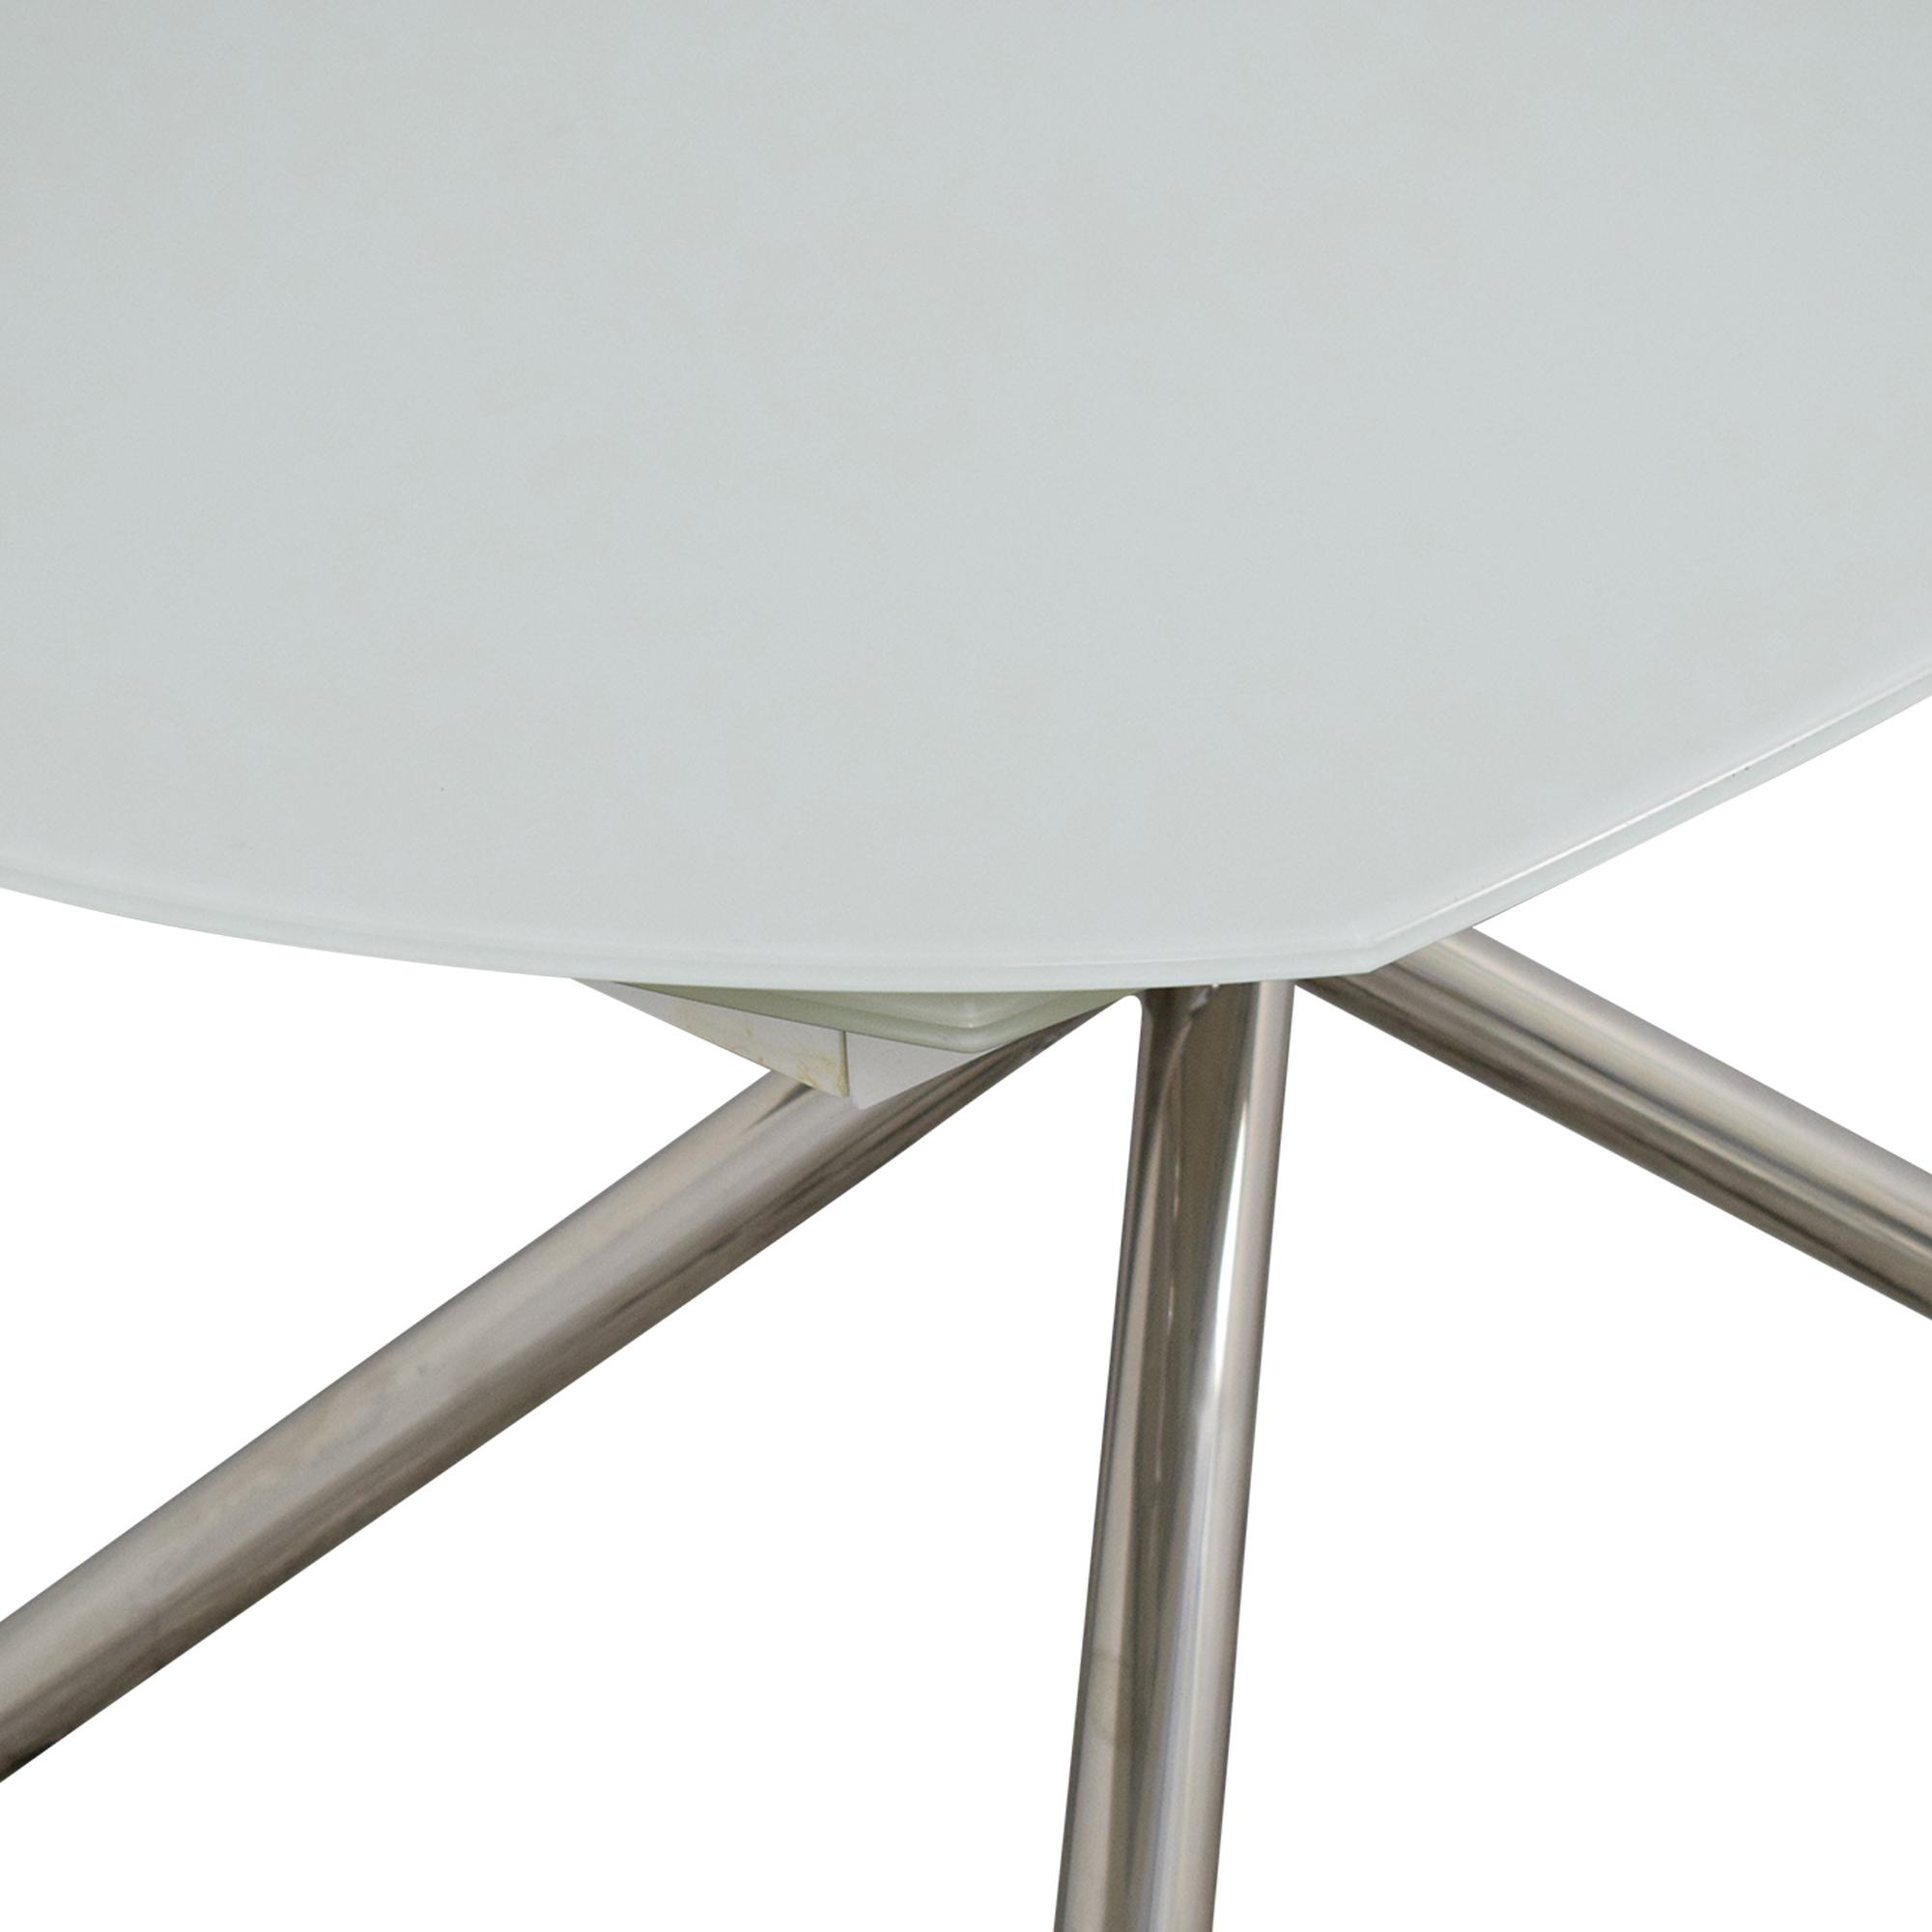 Modani Modani Astro Extendable Dining Table